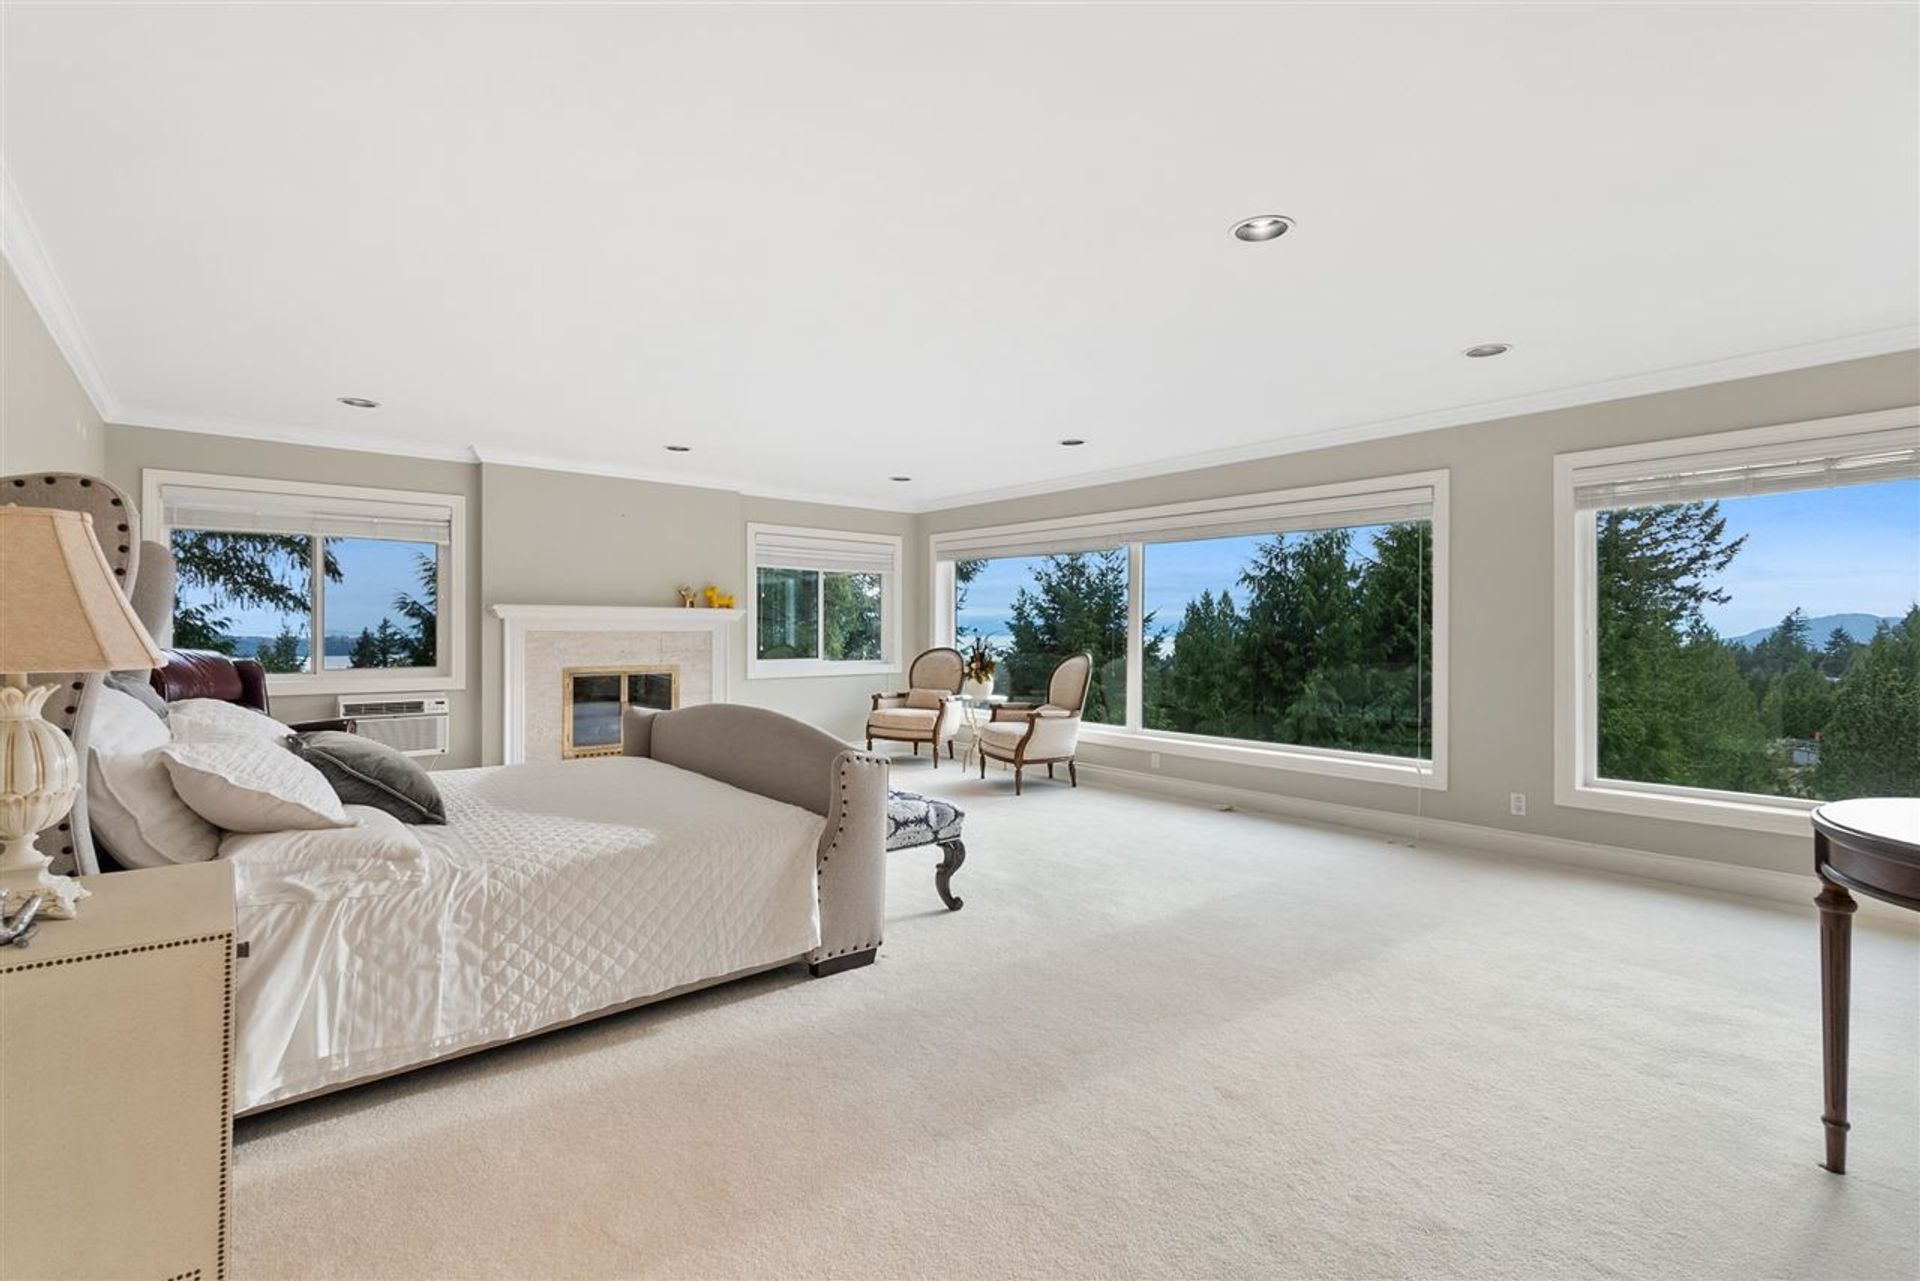 4556-woodgreen-drive-cypress-park-estates-west-vancouver-15 at 4556 Woodgreen Drive, Cypress Park Estates, West Vancouver